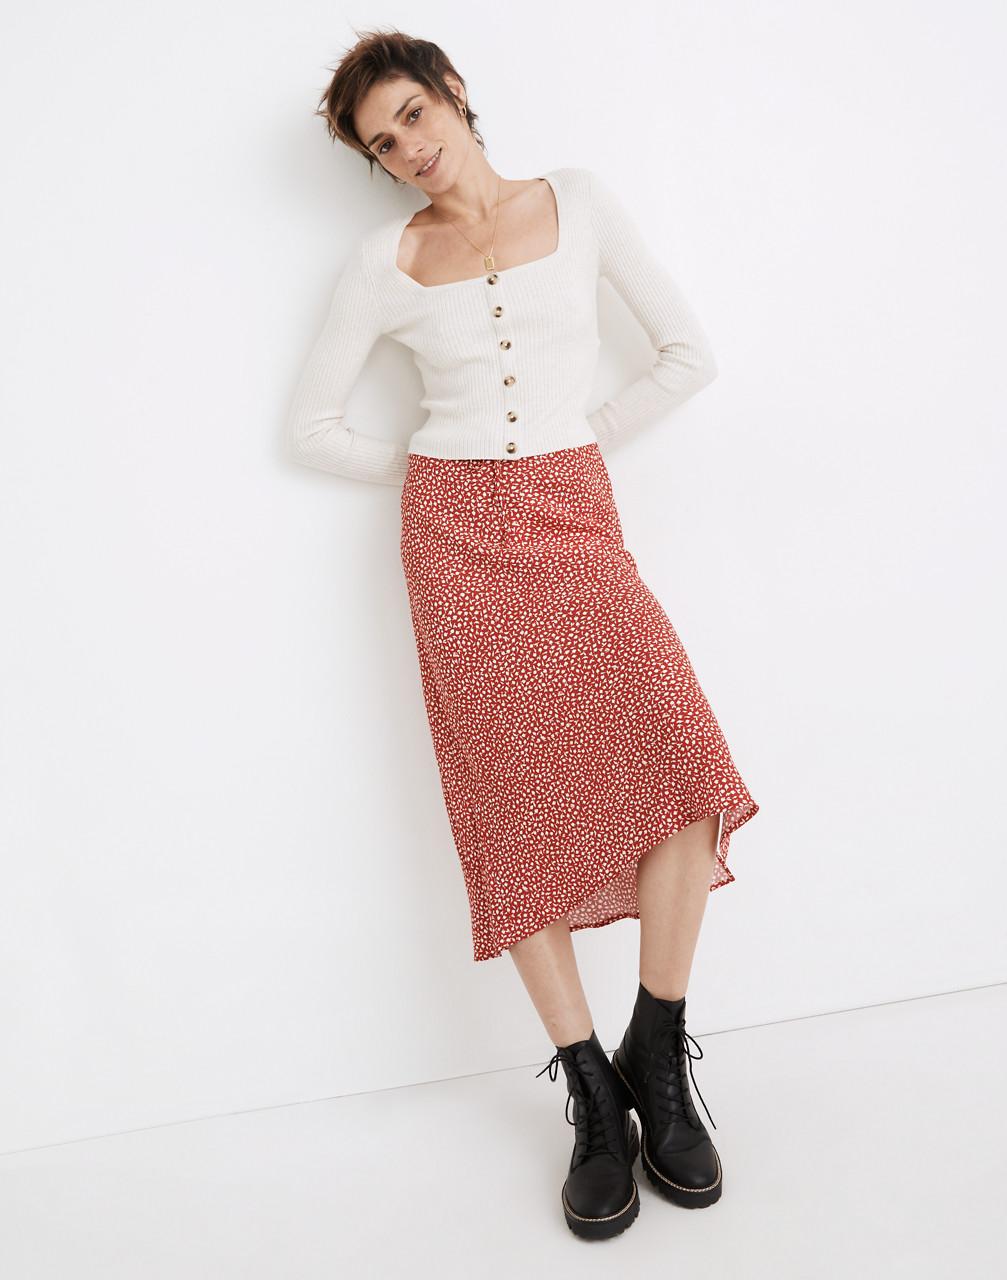 80s Outfit Inspiration, Party Ideas Drawstring Midi Slip Skirt in Park Picnic $98.00 AT vintagedancer.com